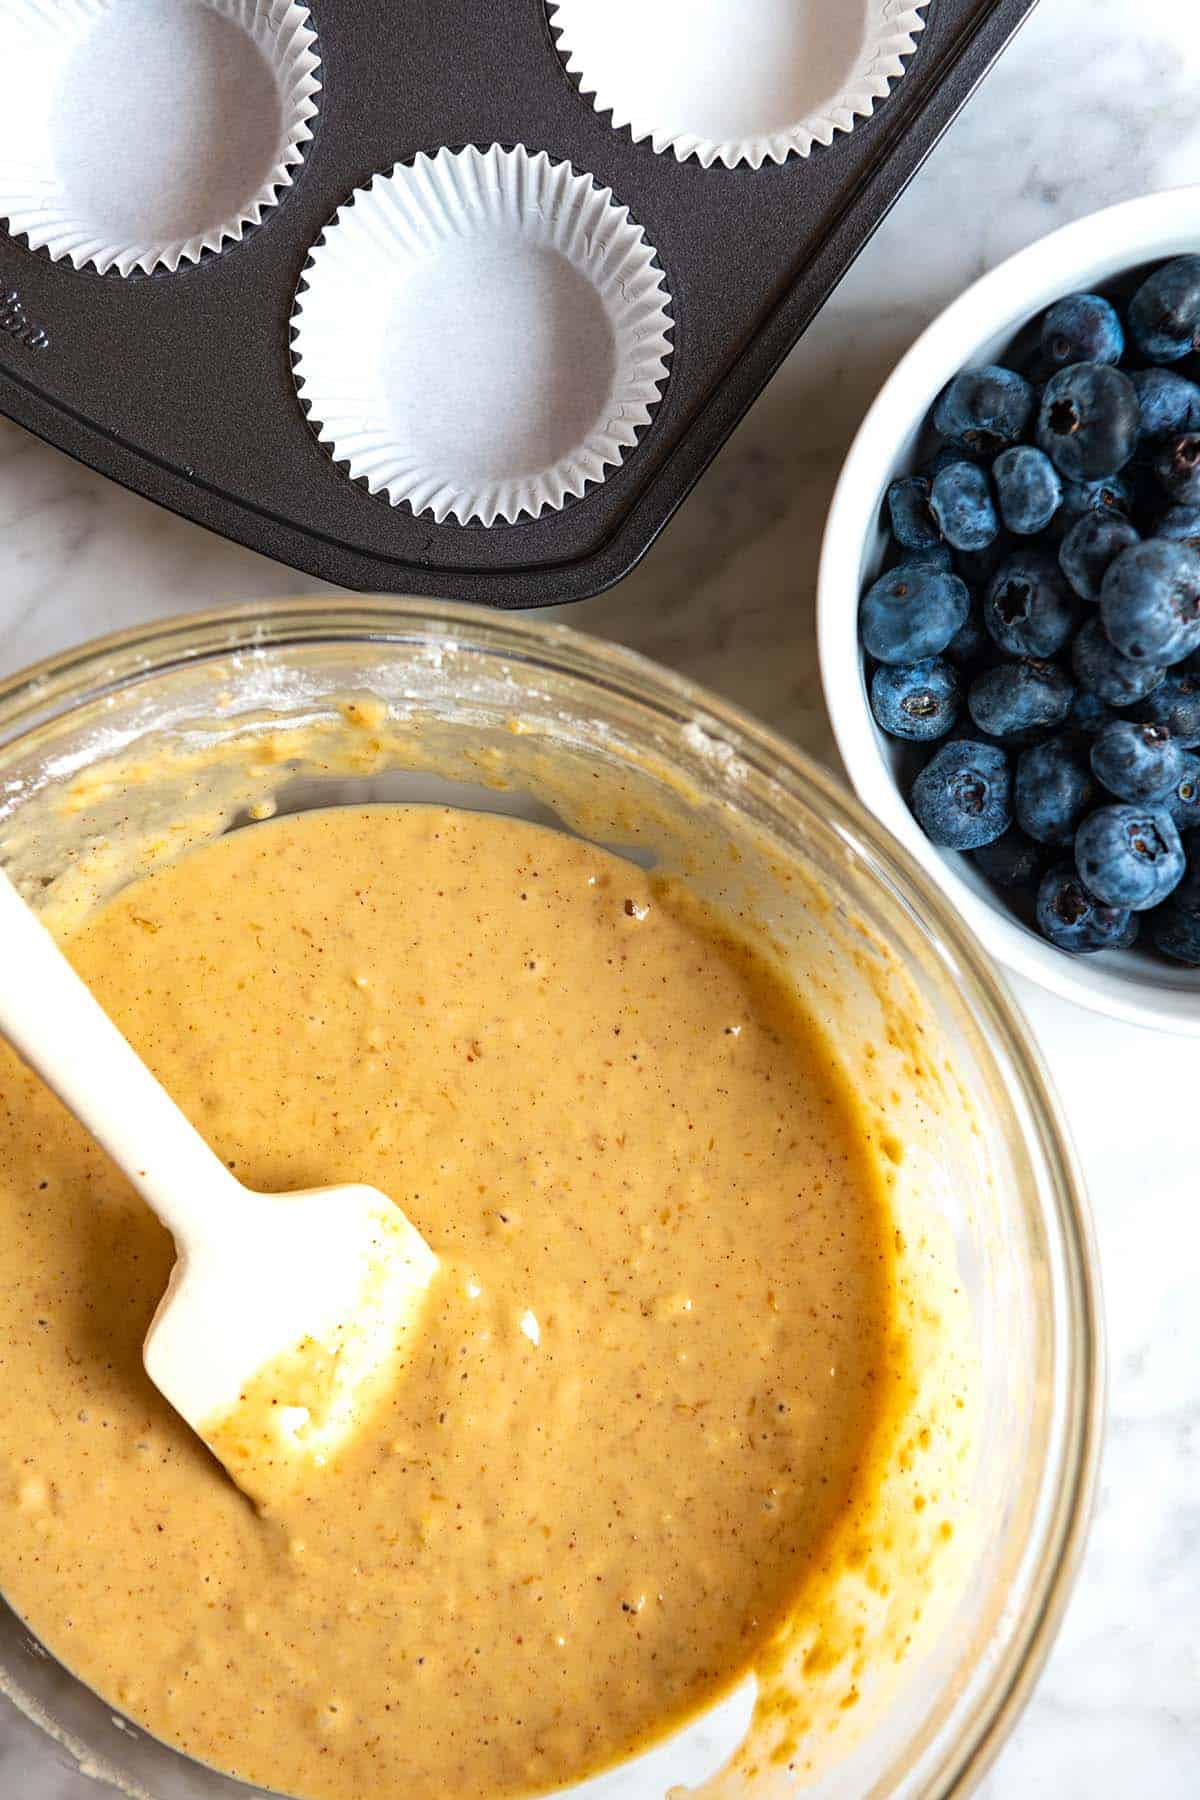 Making vegan blueberry muffin batter